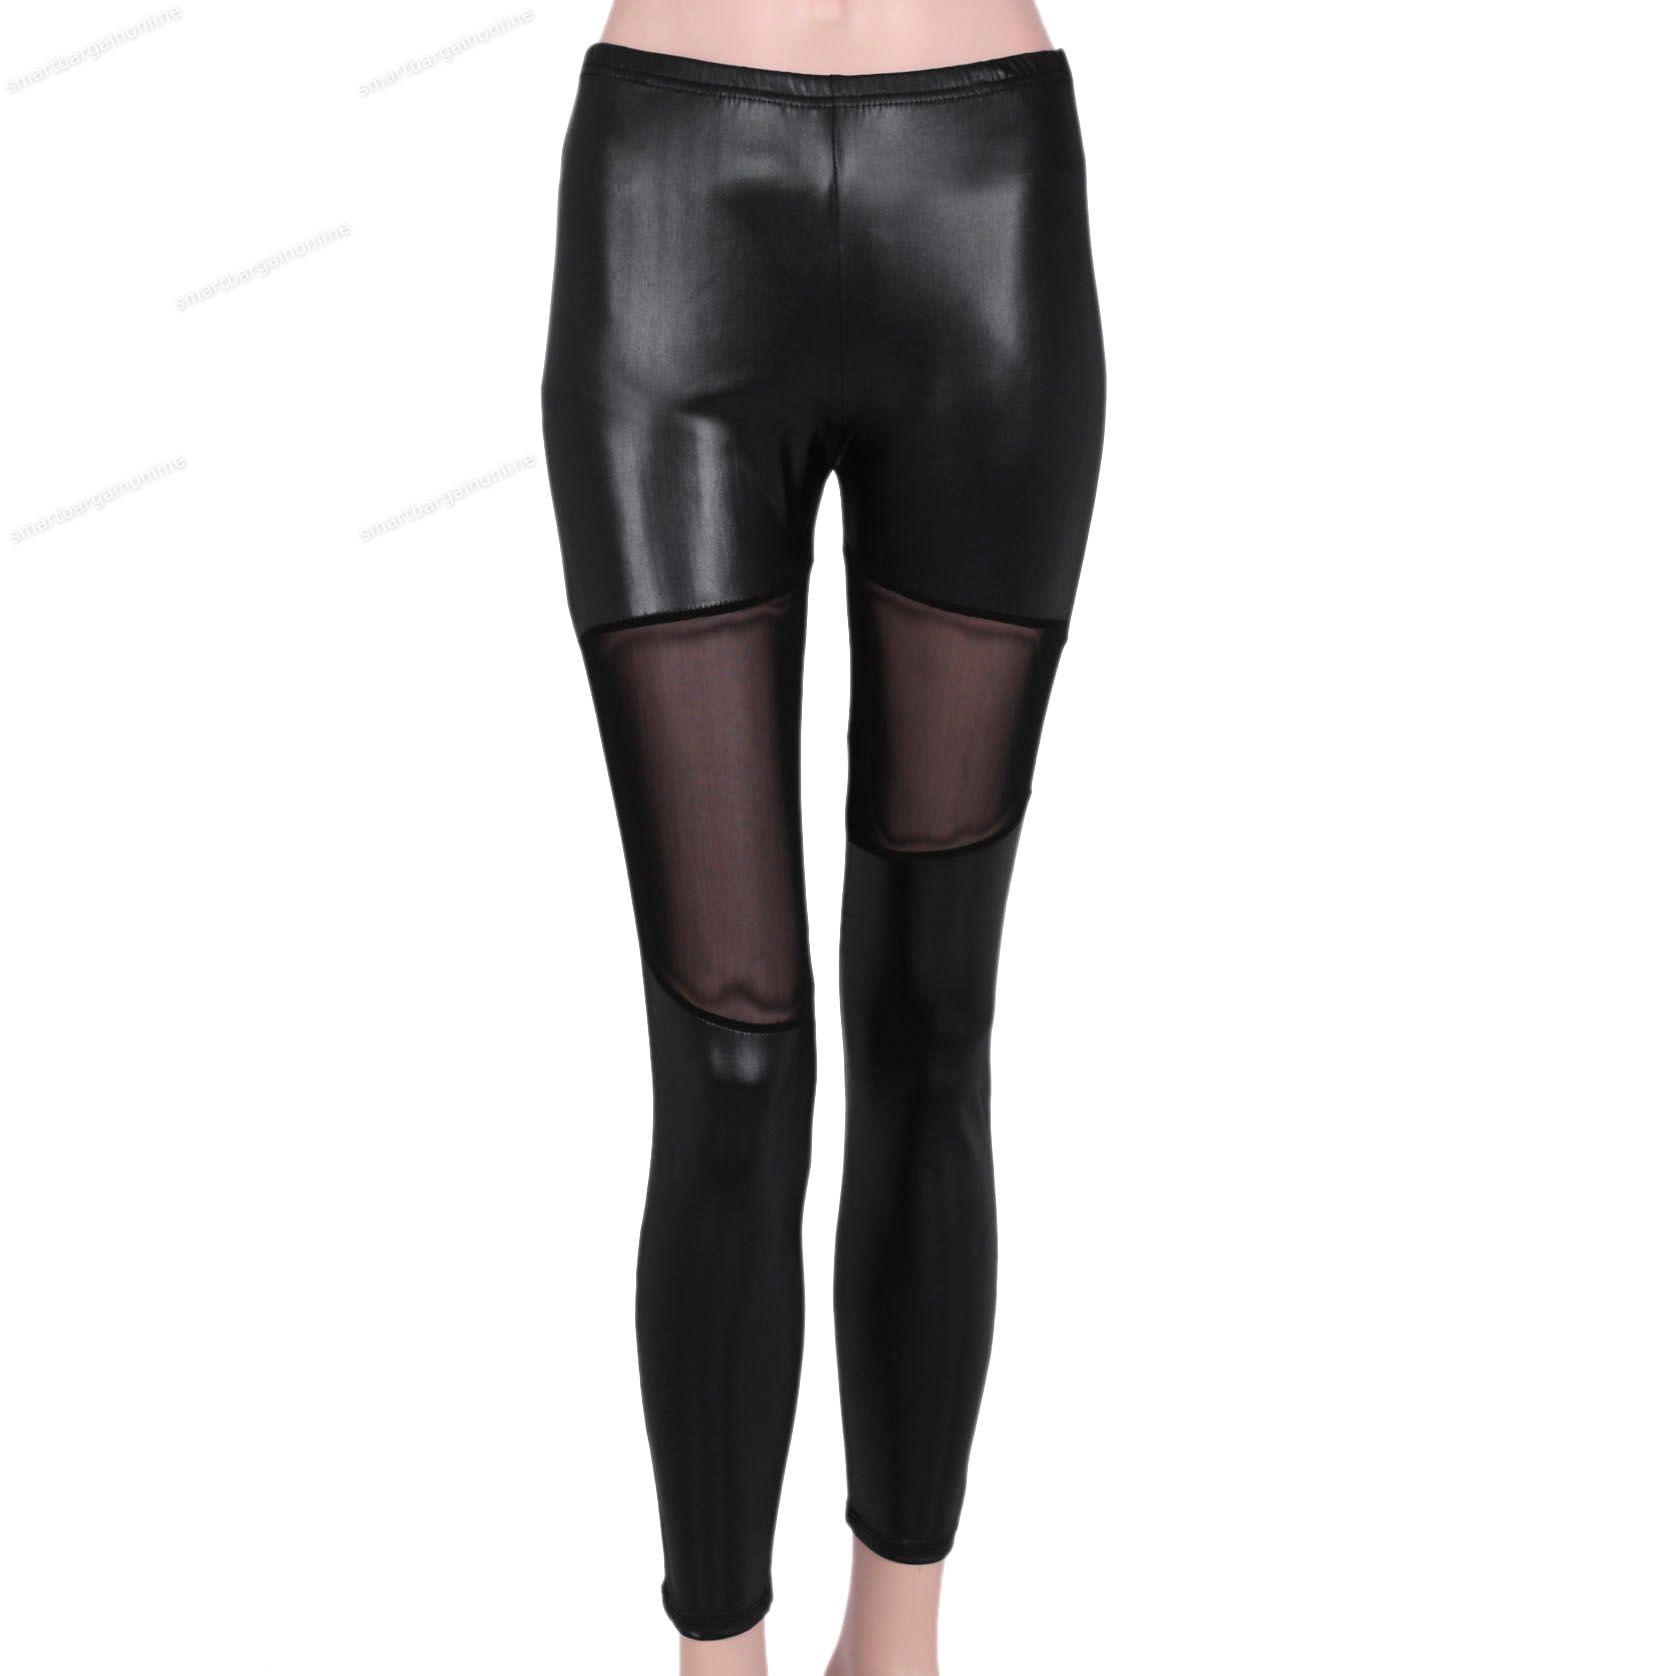 sexy damen leder strumpfhose leggings leggins hose. Black Bedroom Furniture Sets. Home Design Ideas